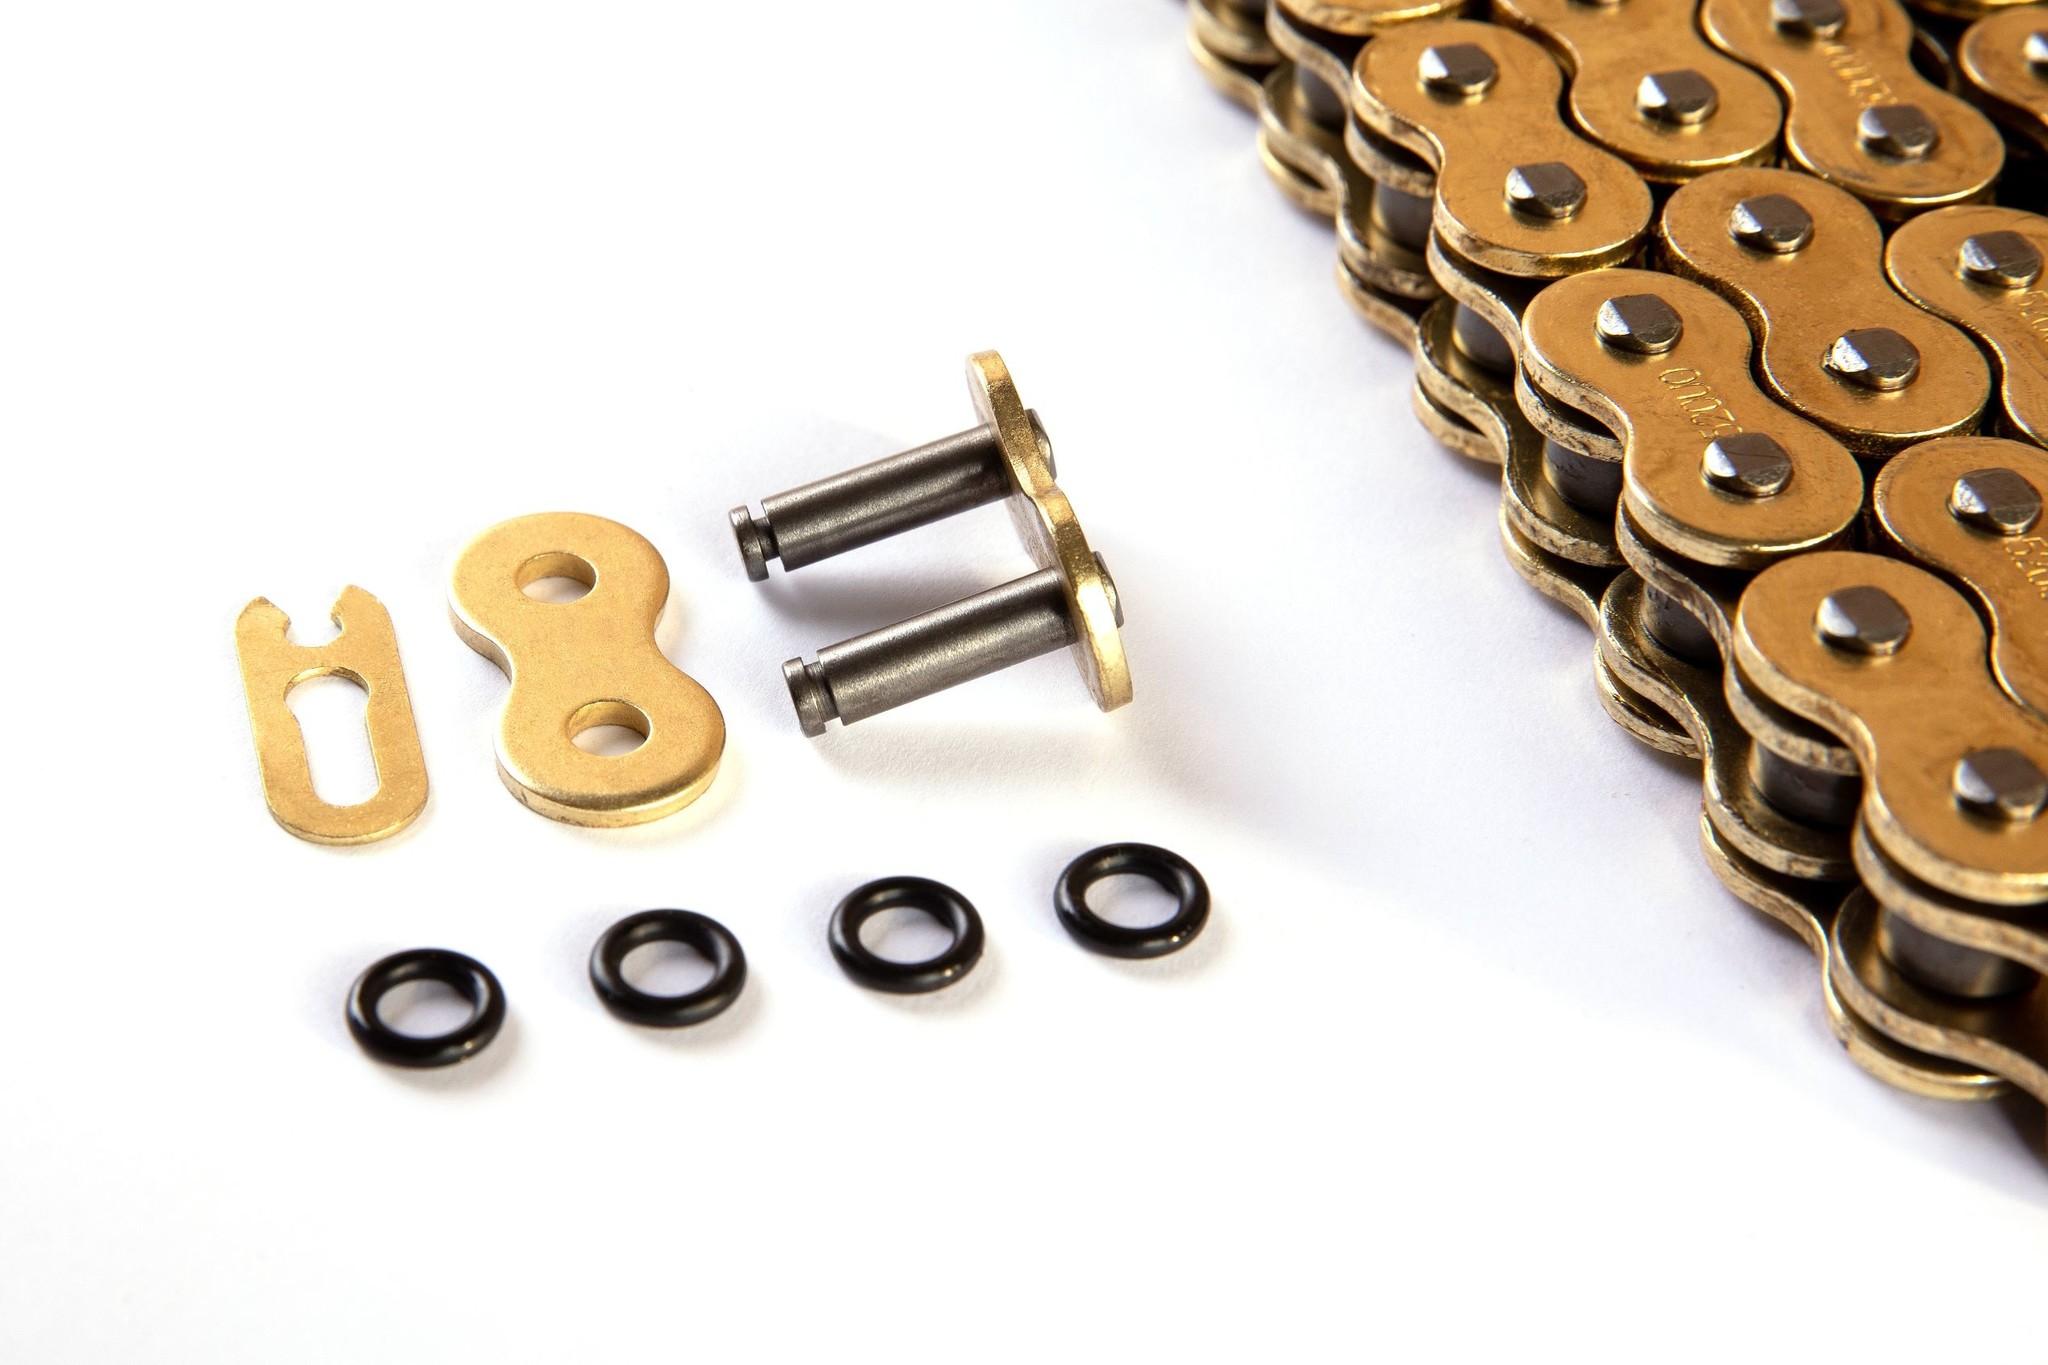 X-GRIP Mr. T Chain O-Ring